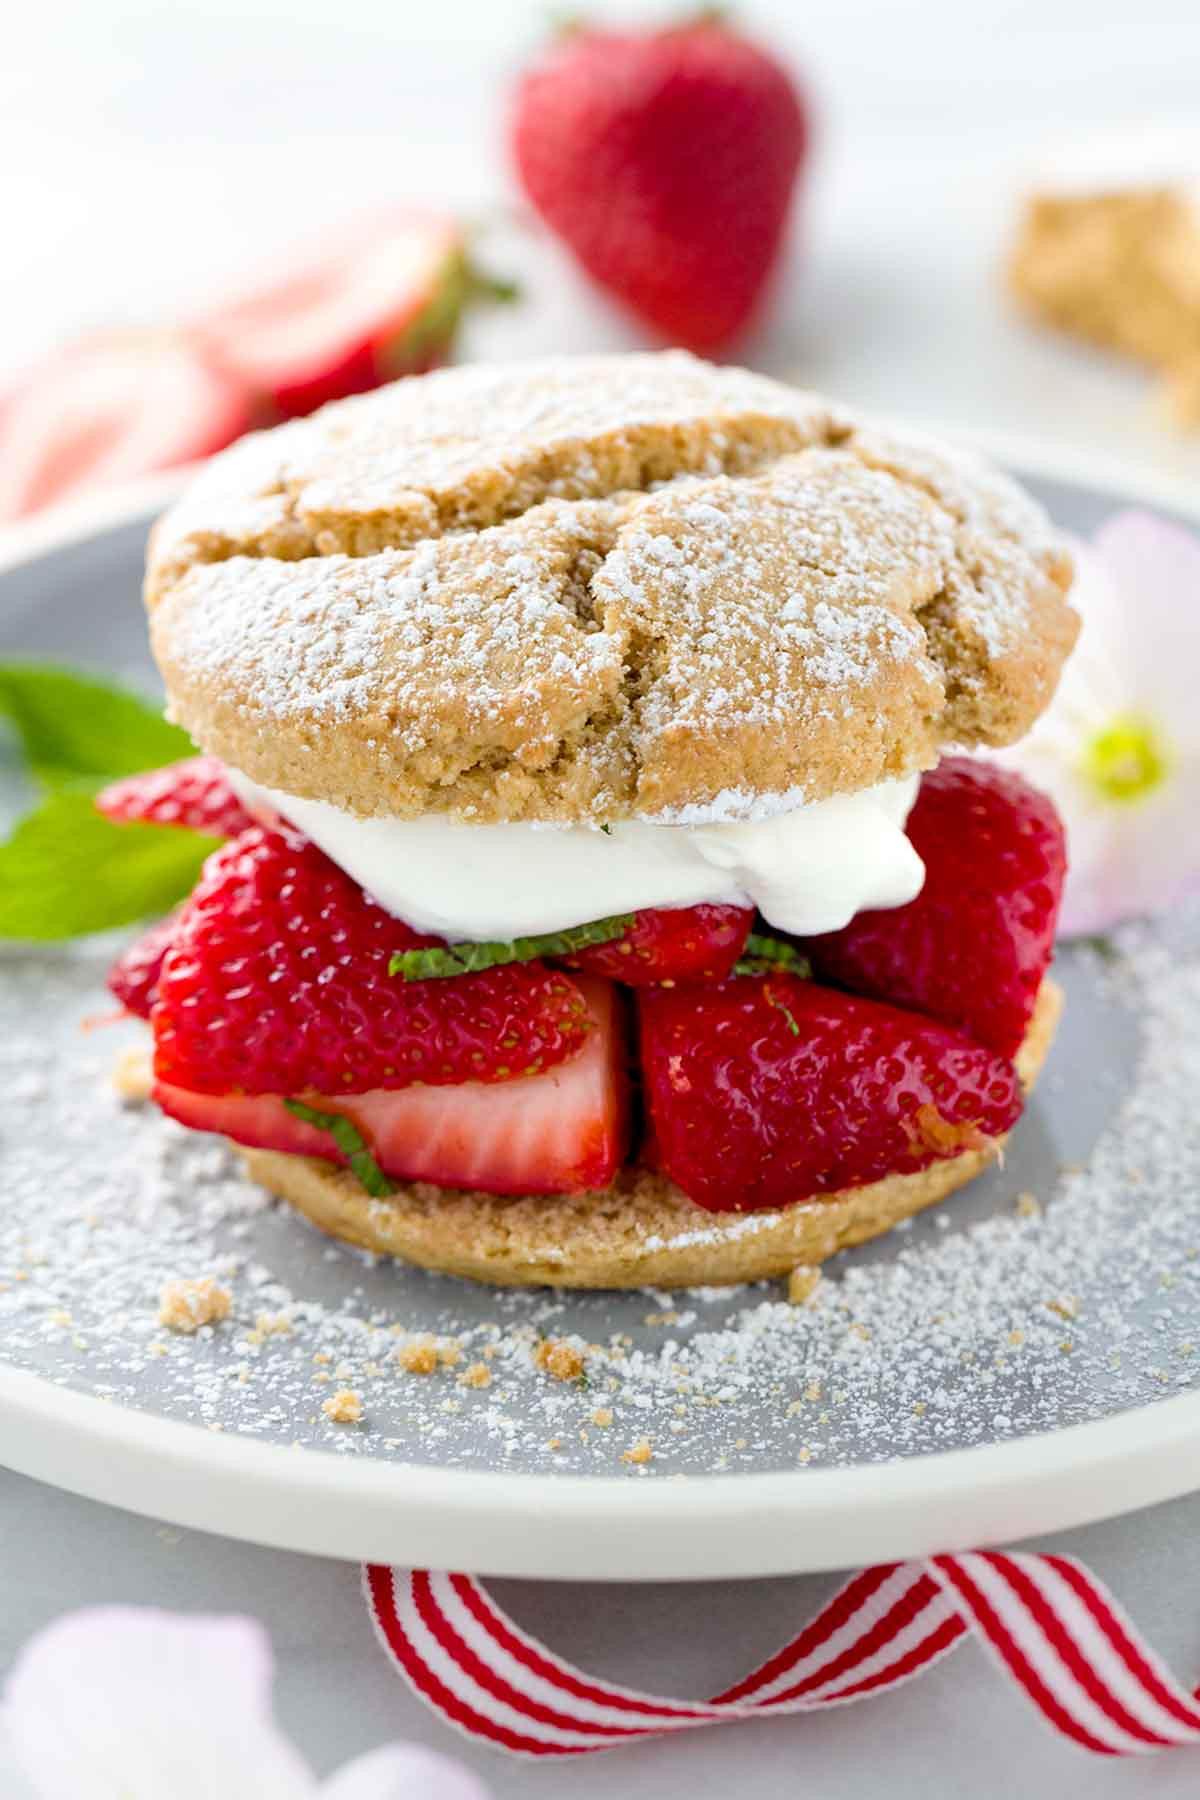 Recipe For Strawberry Shortcake  Strawberry Shortcake Recipe with Whipped Cream